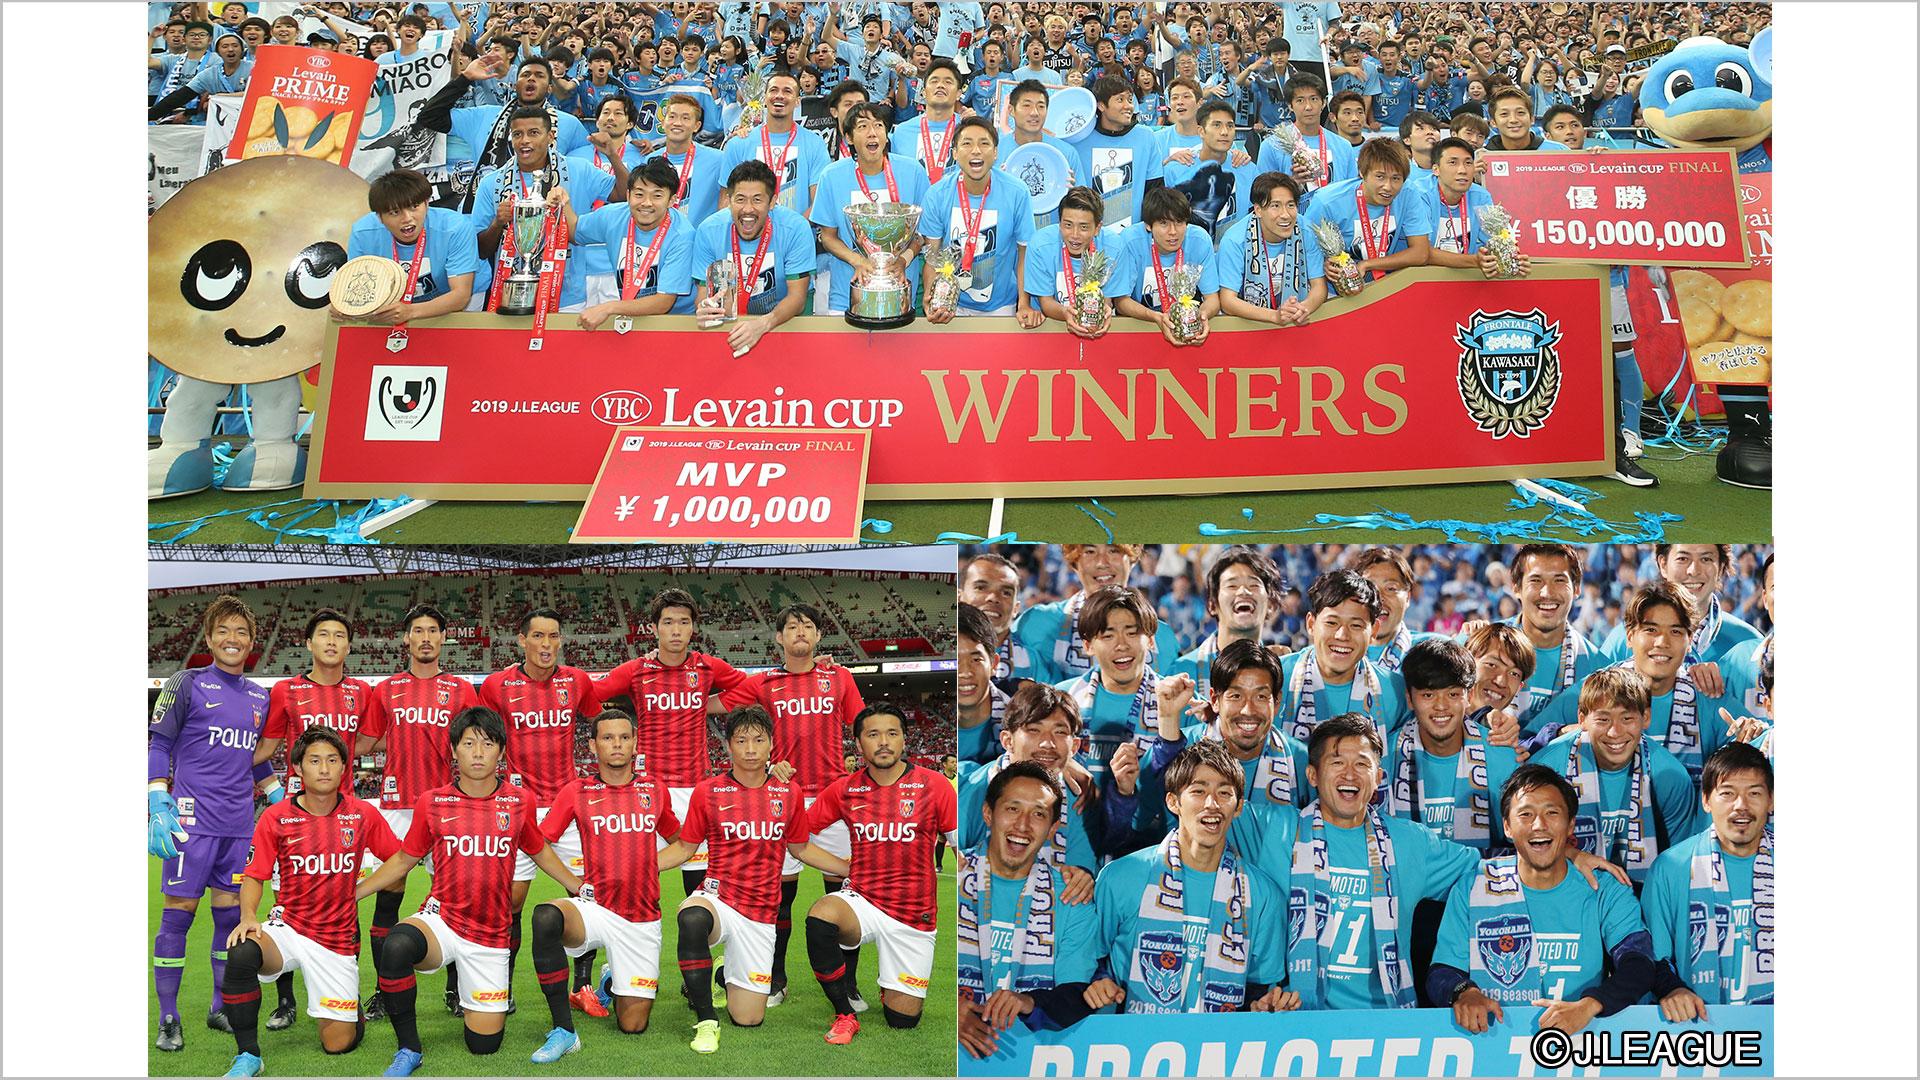 2020 JリーグYBCルヴァンカップ グループステージ 第2節 Bグループ サガン鳥栖 vs 横浜FC